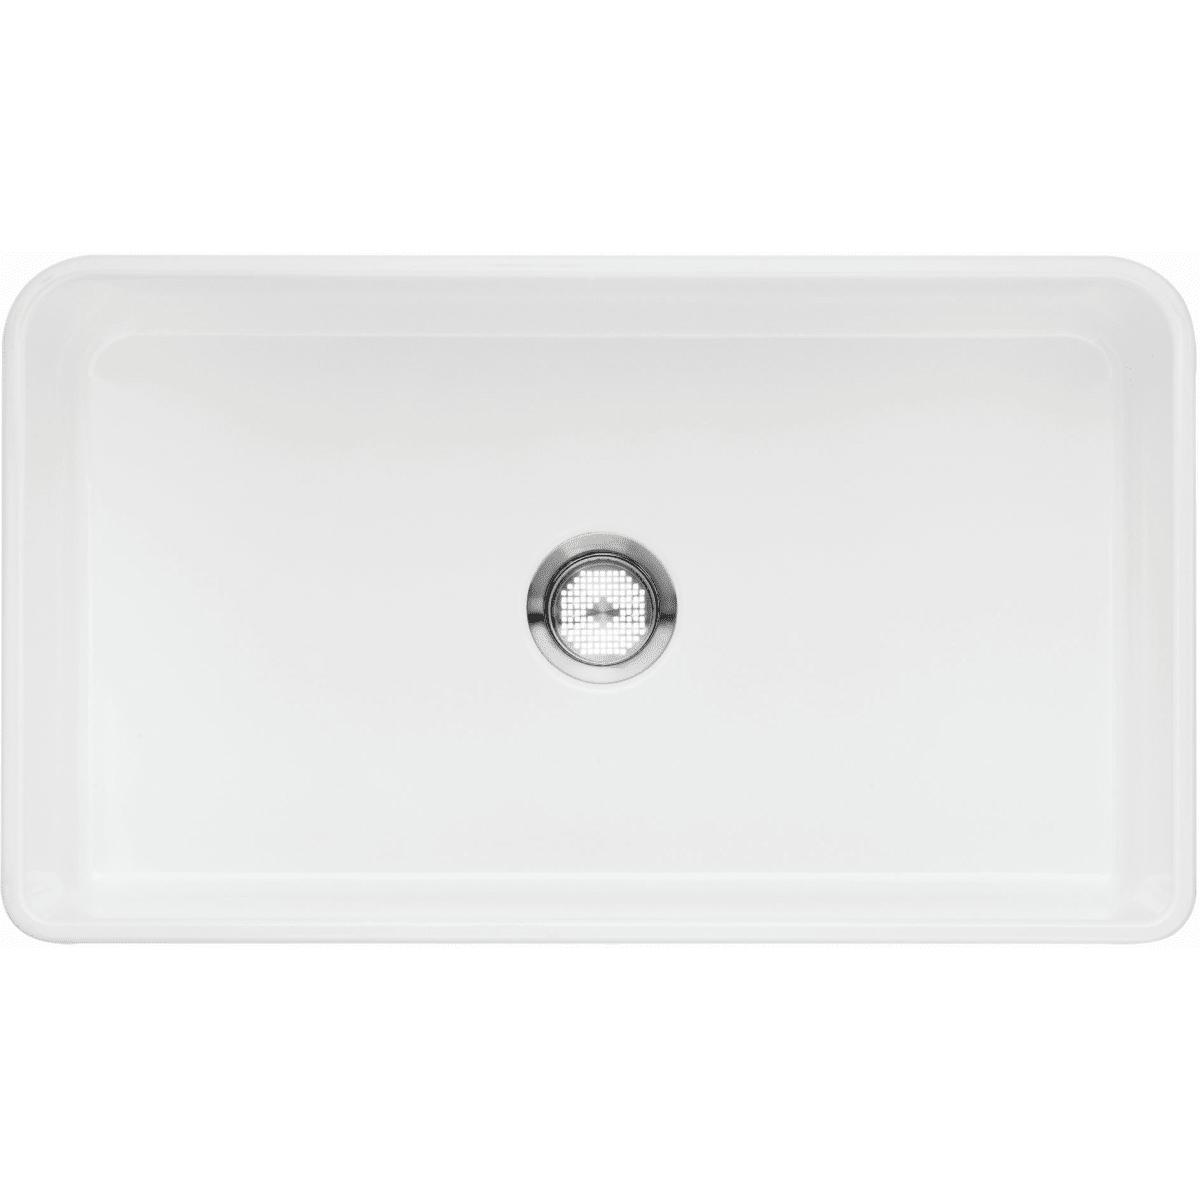 "Blanco Cerana 33"" Farmhouse Single Basin Fireclay Kitchen Sink"